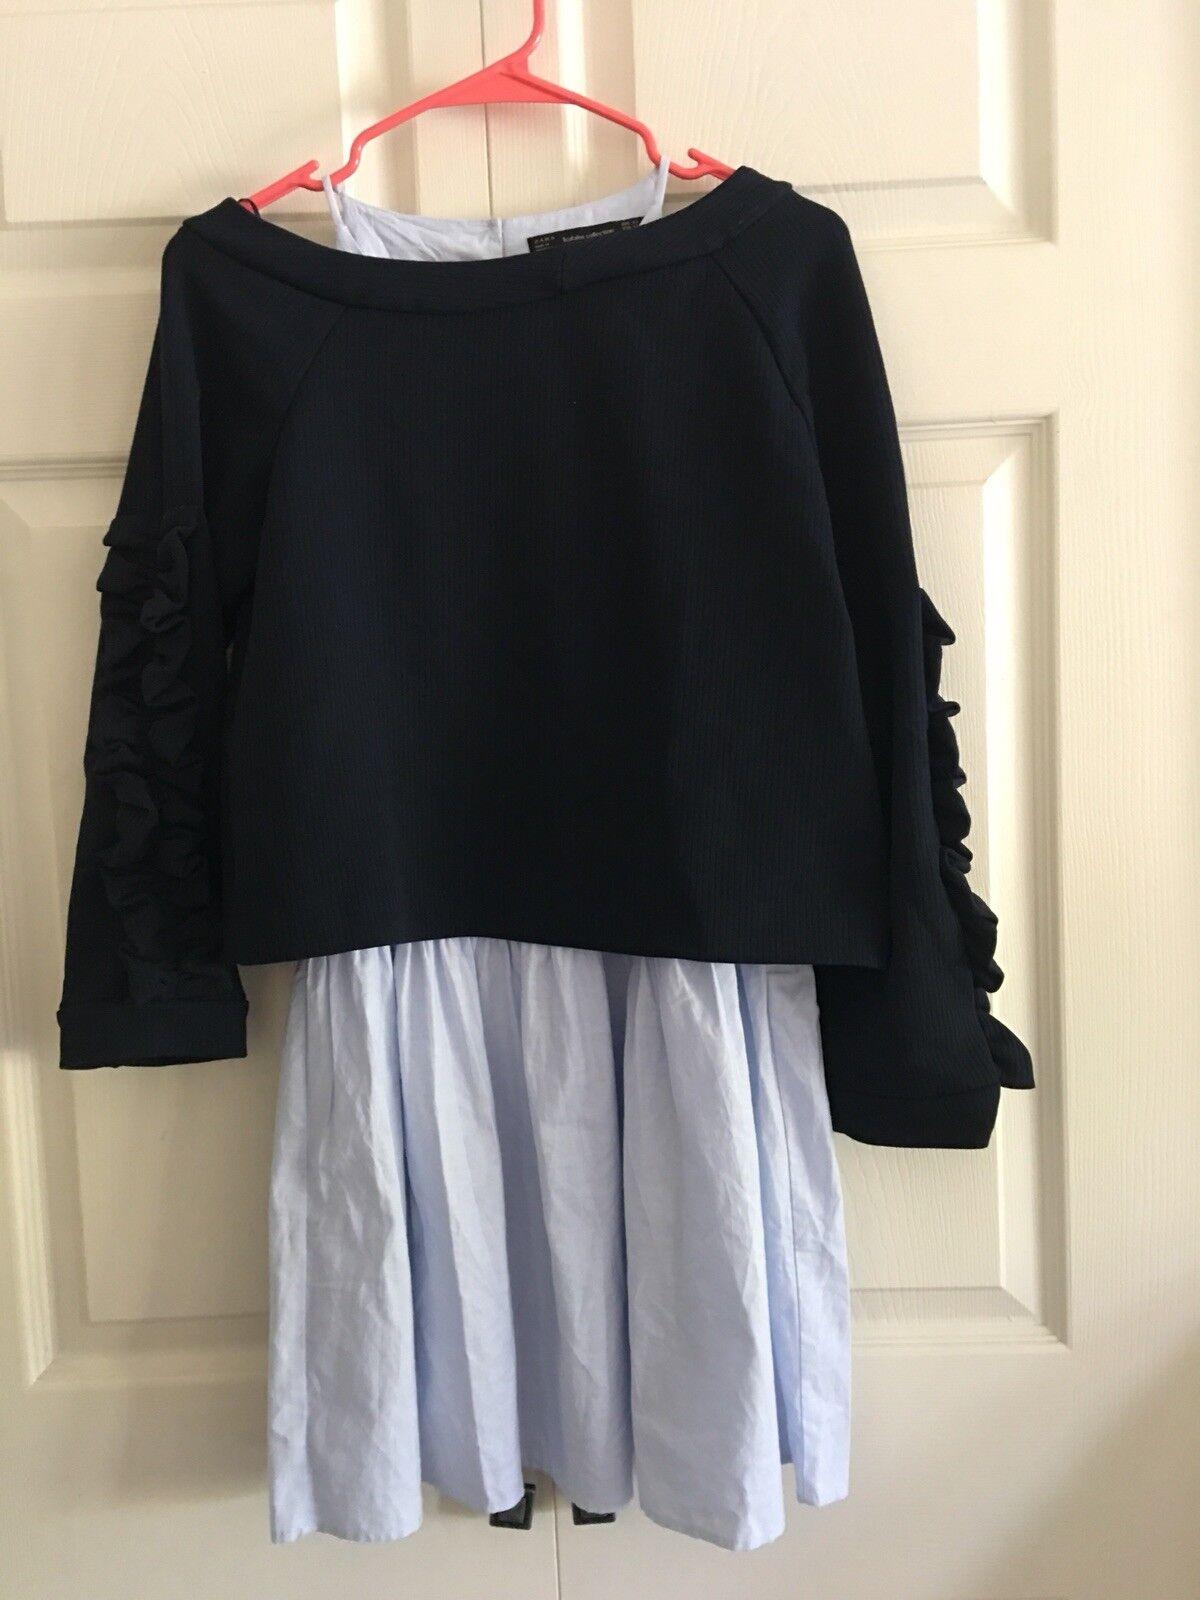 NWT ZARA Navy bluee Contrast Dress Blouse 2 Pieces Size M